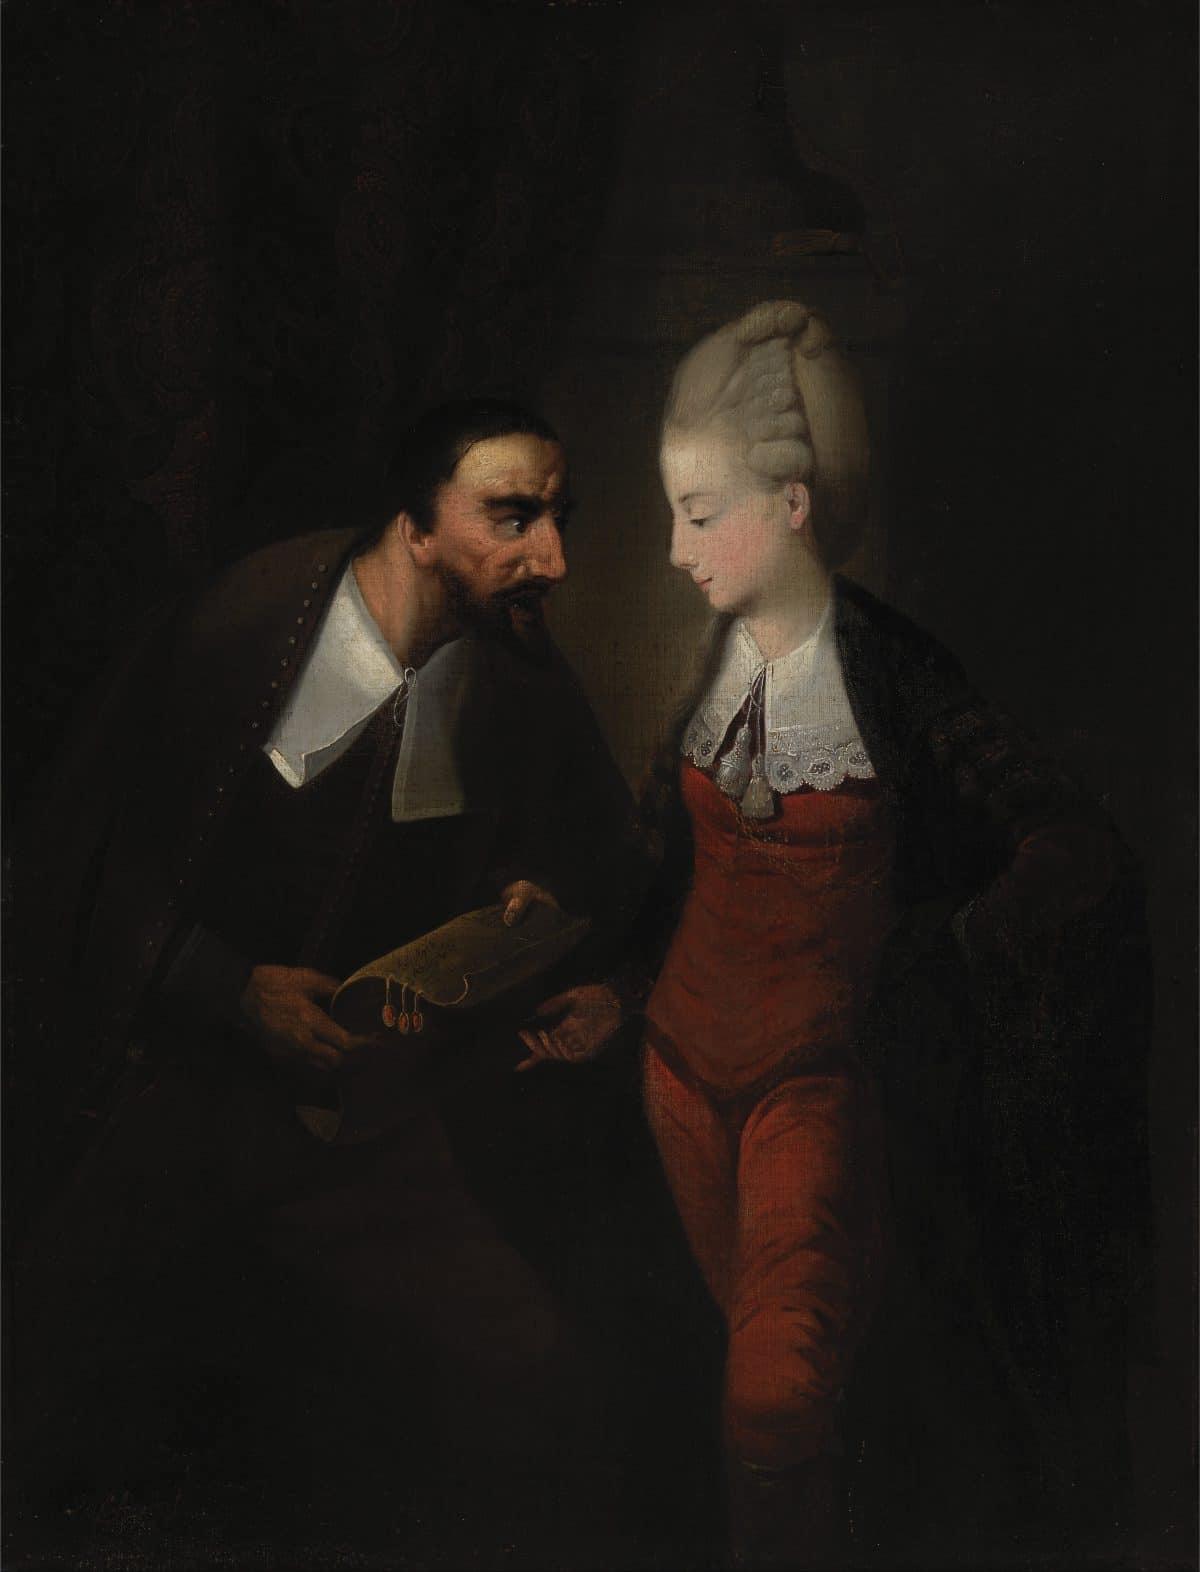 edward_alcock_-_portia_and_shylock_from_shakespeares_-the_merchant_of_venice-_iv_i_-_google_art_project